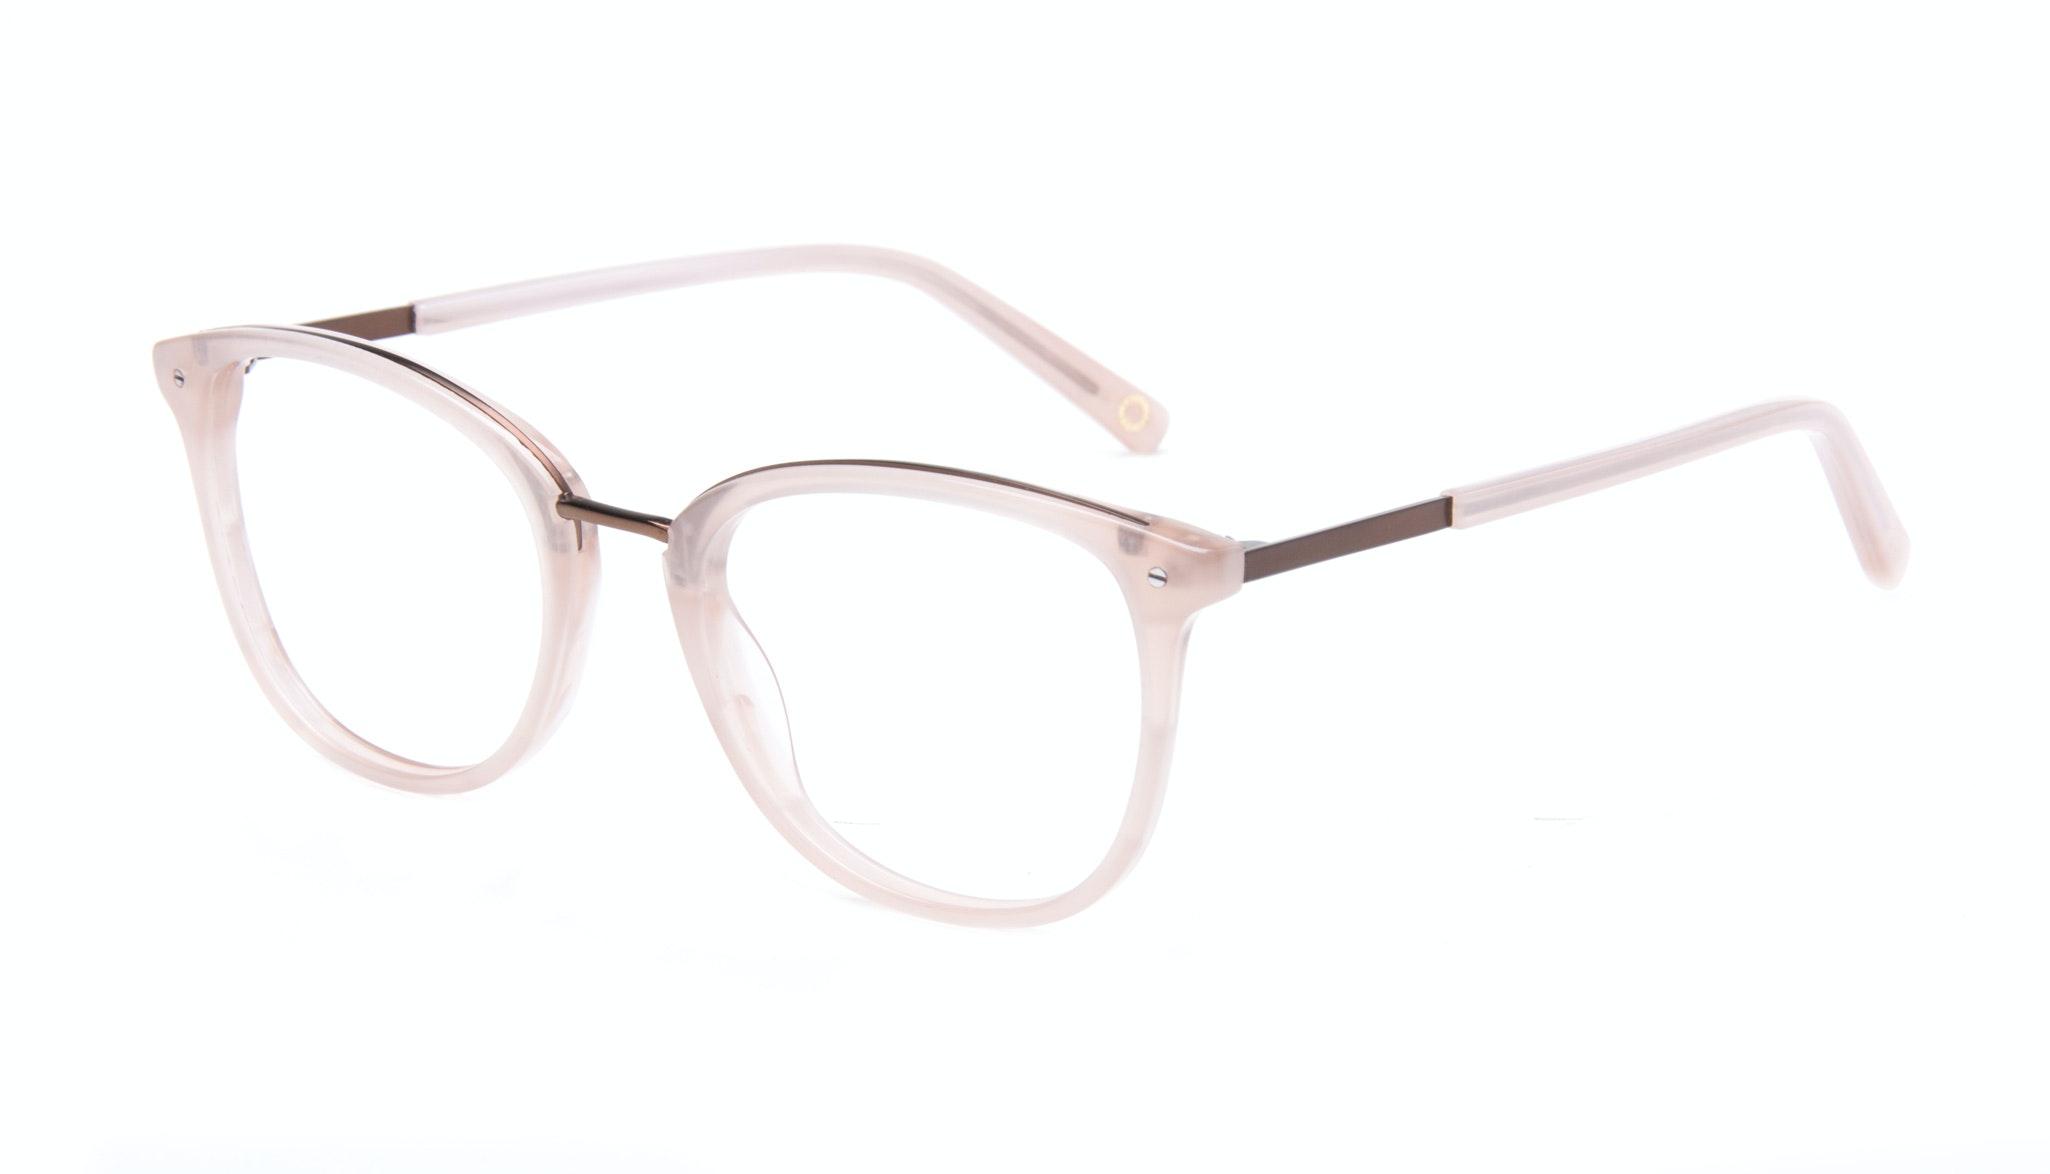 Affordable Fashion Glasses Square Round Eyeglasses Women Ella Blush Tilt